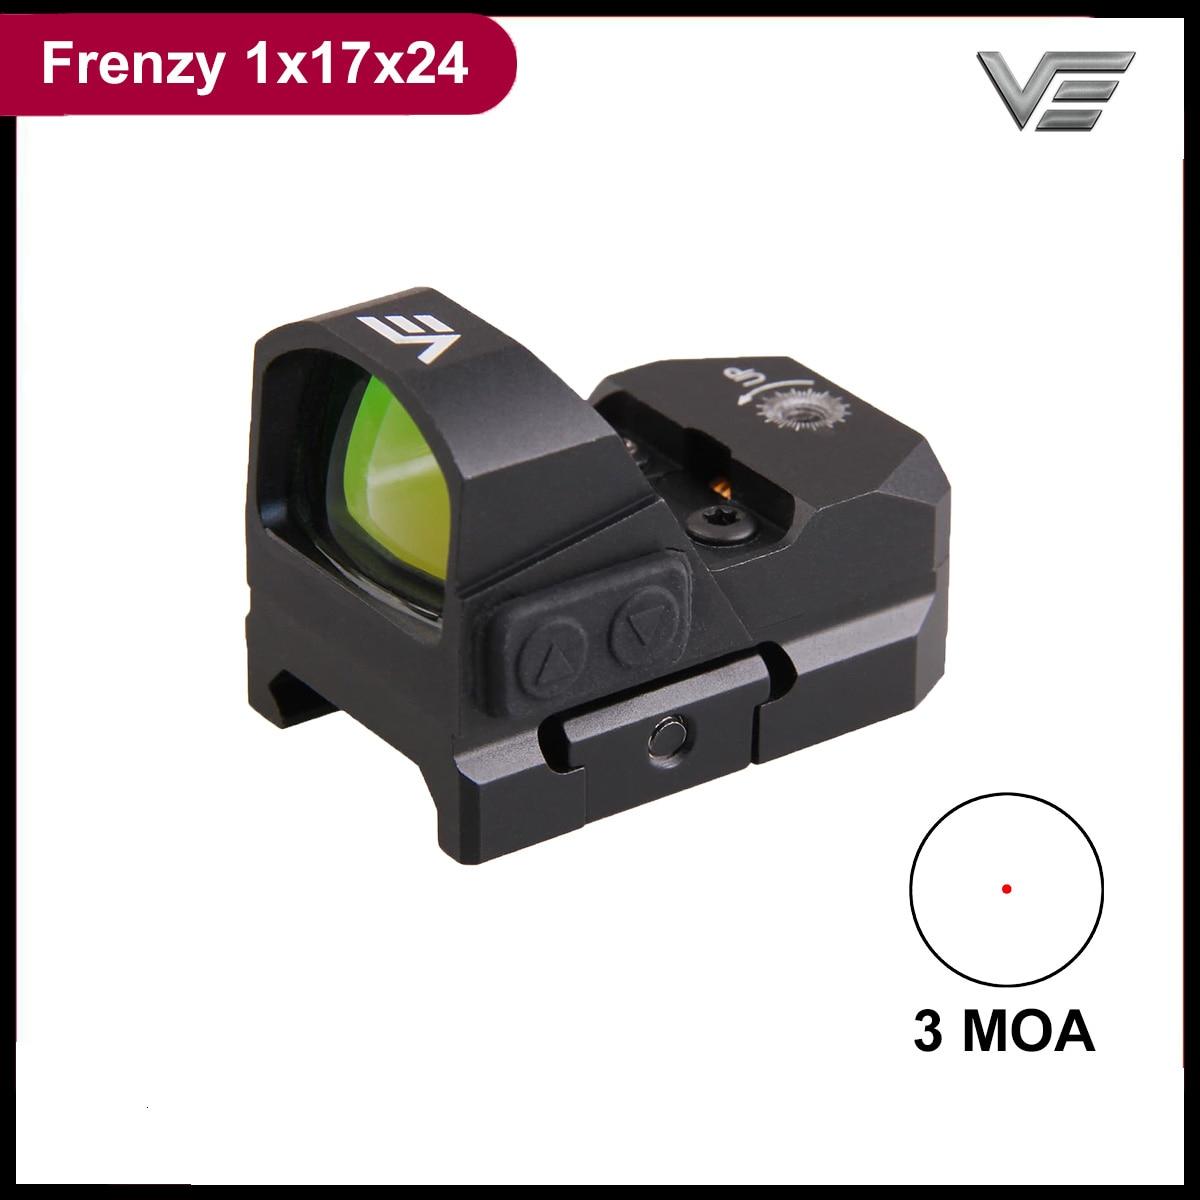 Vector Optics Frenzy 1x17x24 AR15 M4 AK47 Pistol Red Dot Scope 9mm Mini Sight With Water Proof Fit 21mm Picatinny GLOCK 17 19|Riflescopes|   - AliExpress